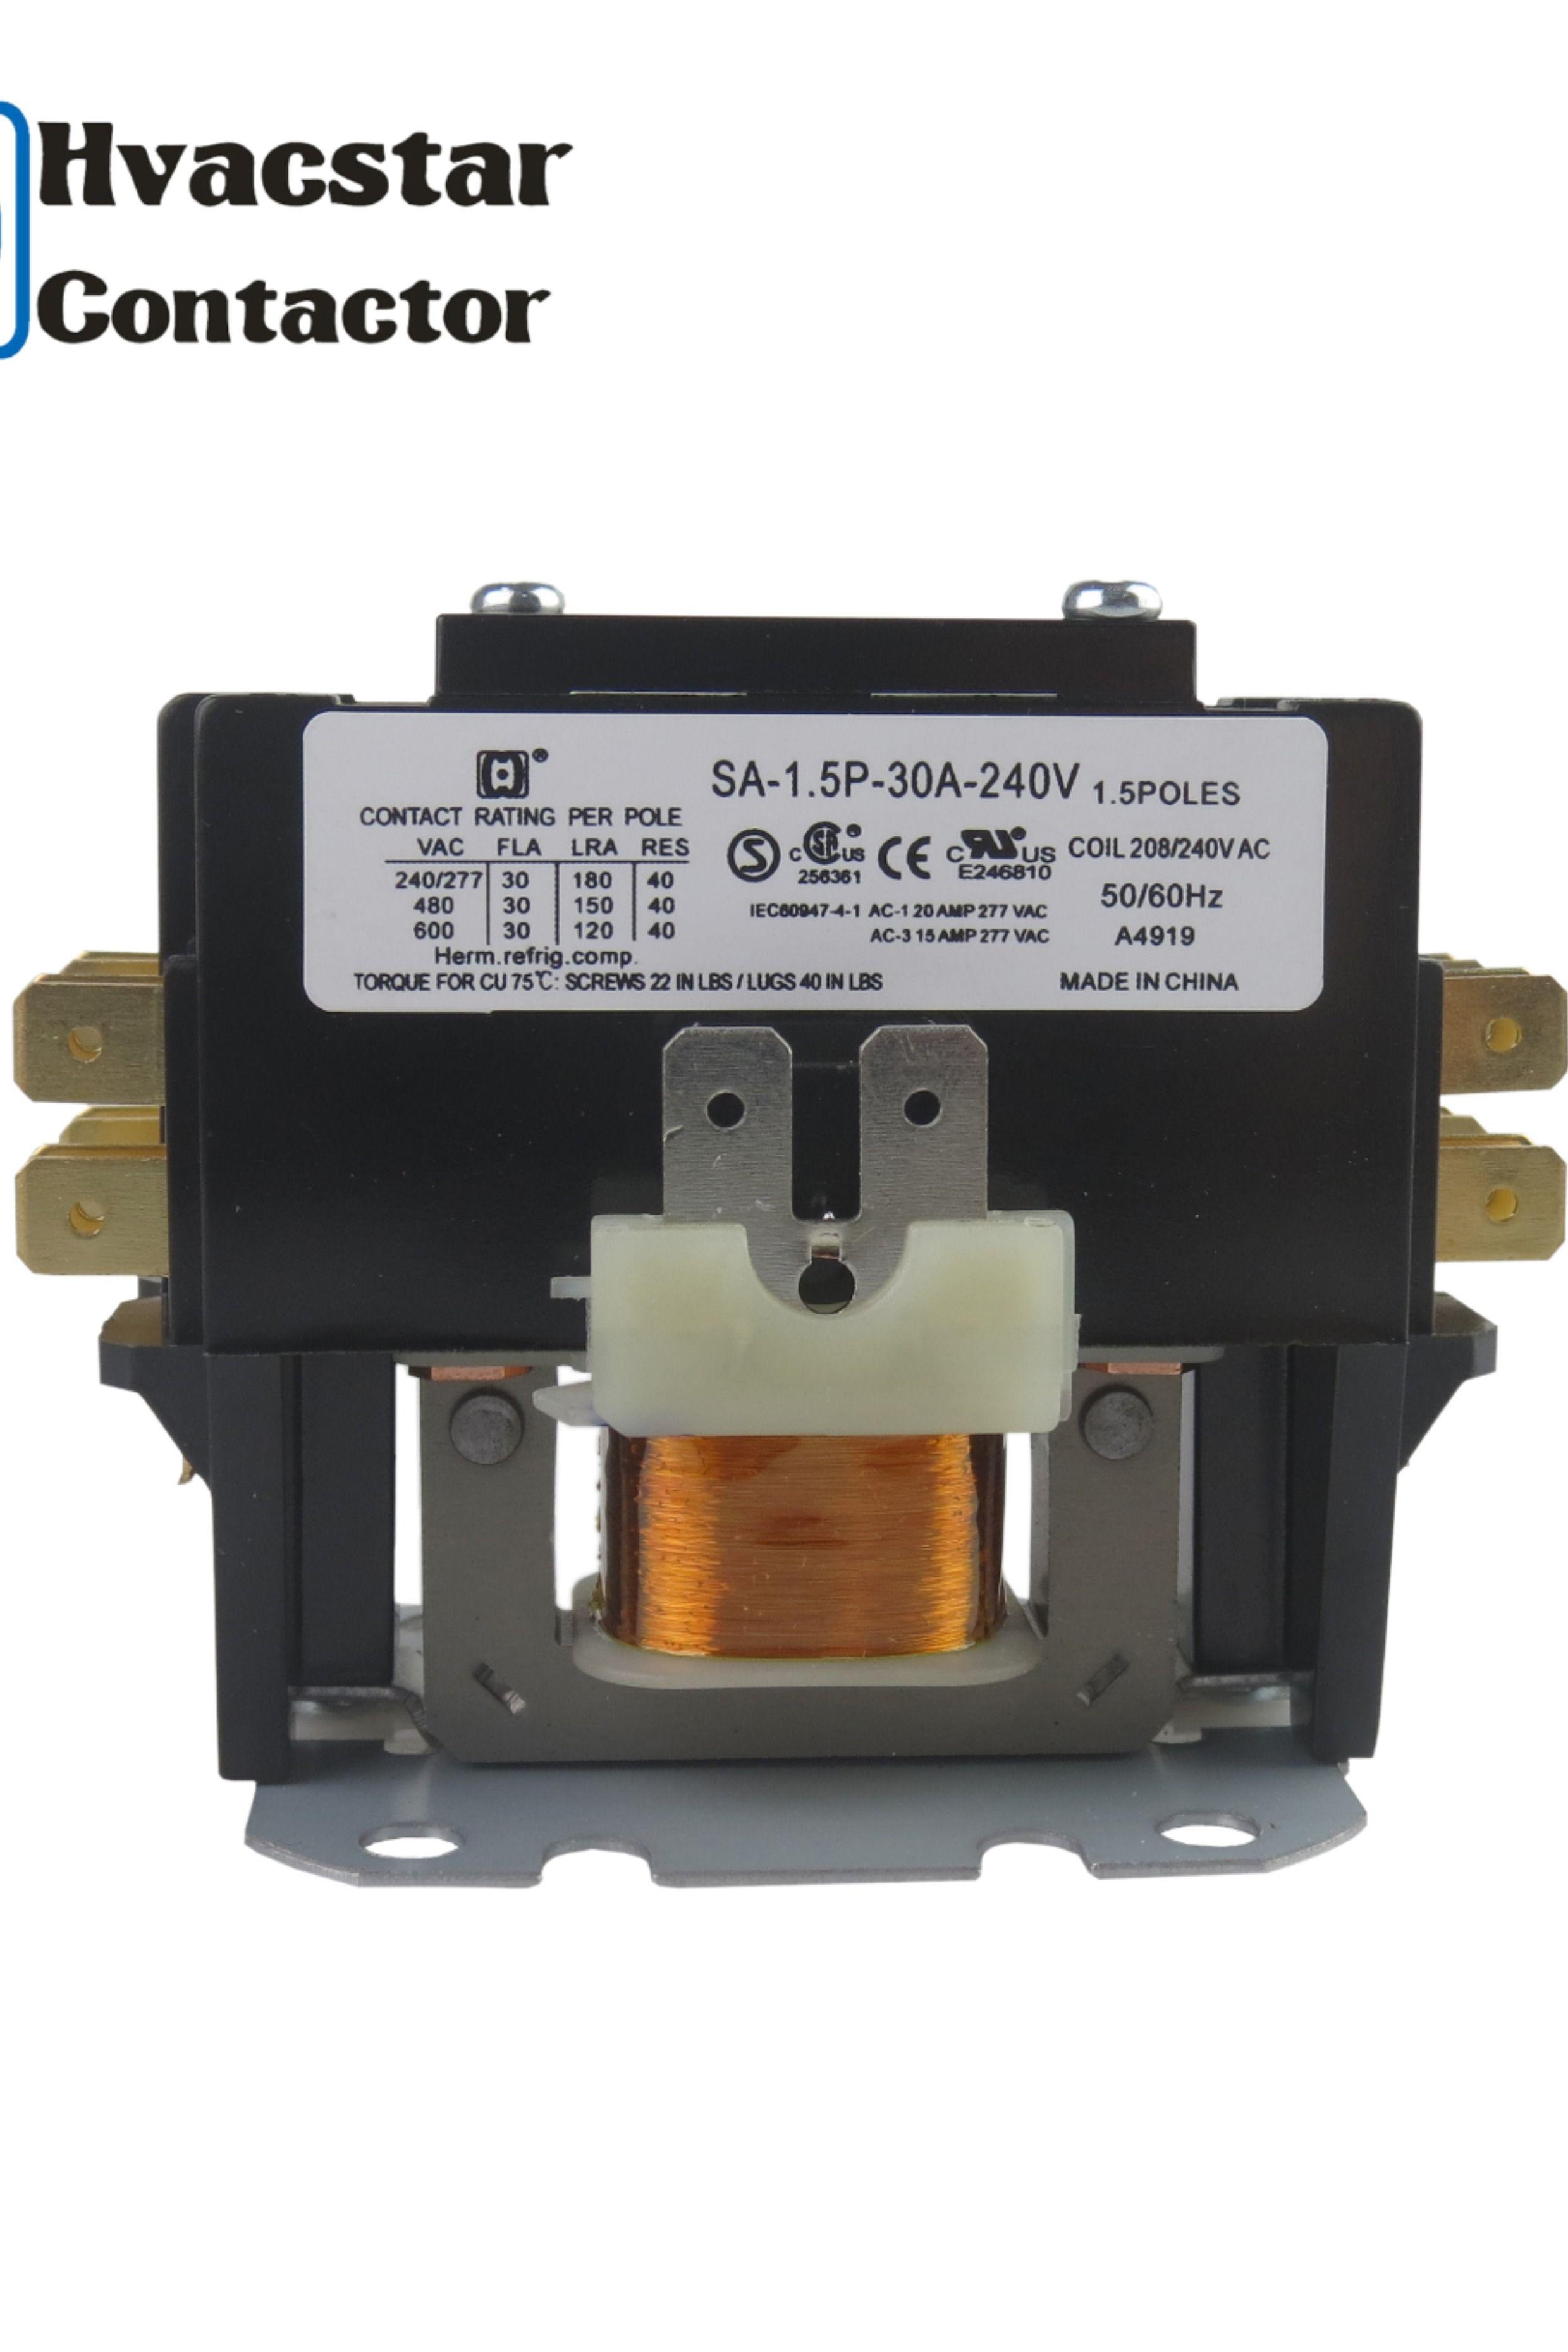 Hot Sales High Quality Ac Contactors Air Conditioner Air Conditioner Installation Hvac